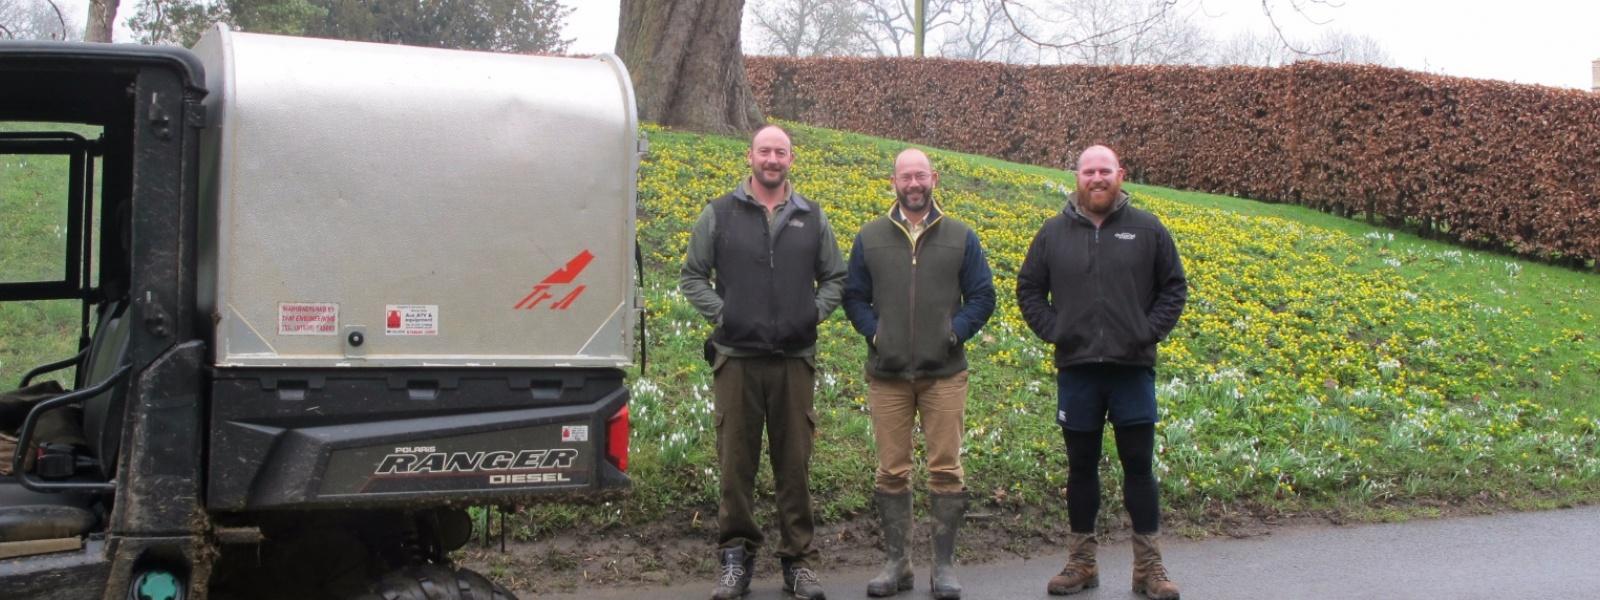 Overbury Enterprises Staff Team -